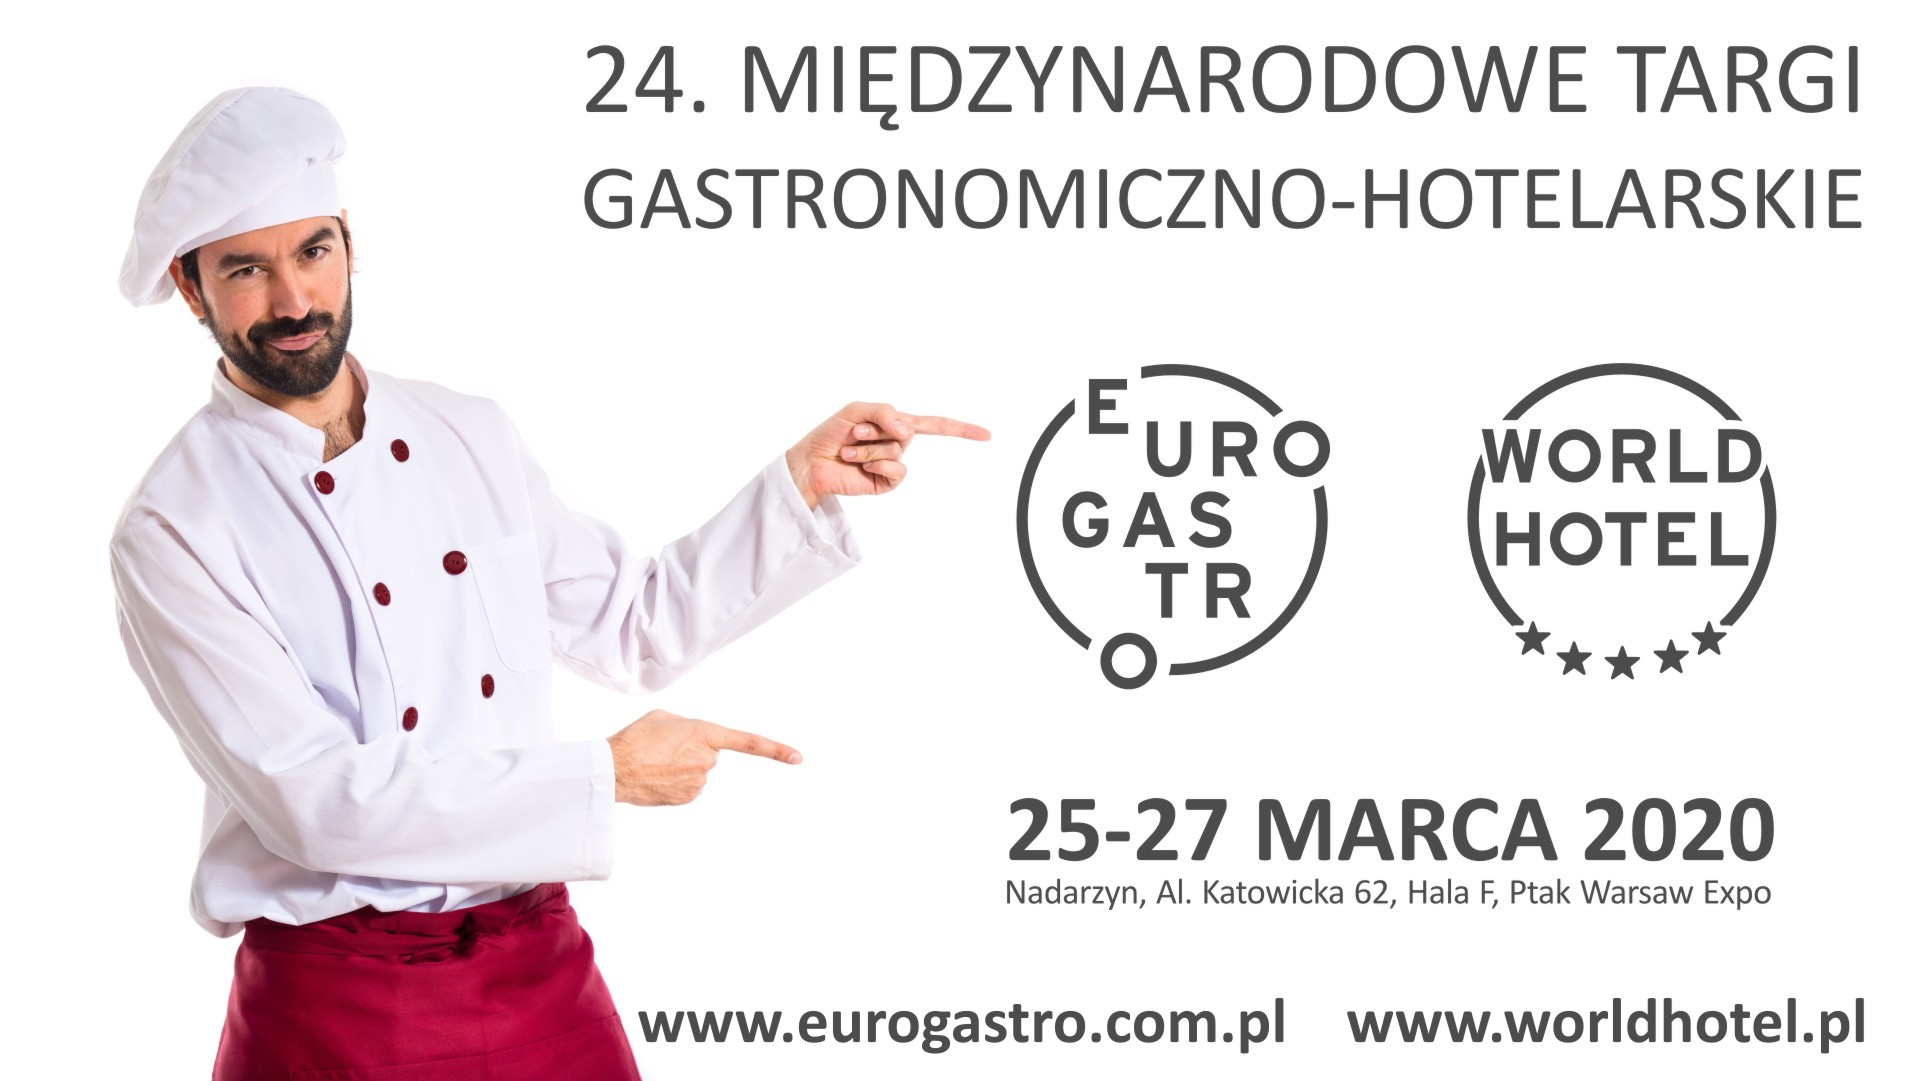 24 międzynarodowe targi gastronomiczno-hotelarskie Eurogastro I WorldHotel